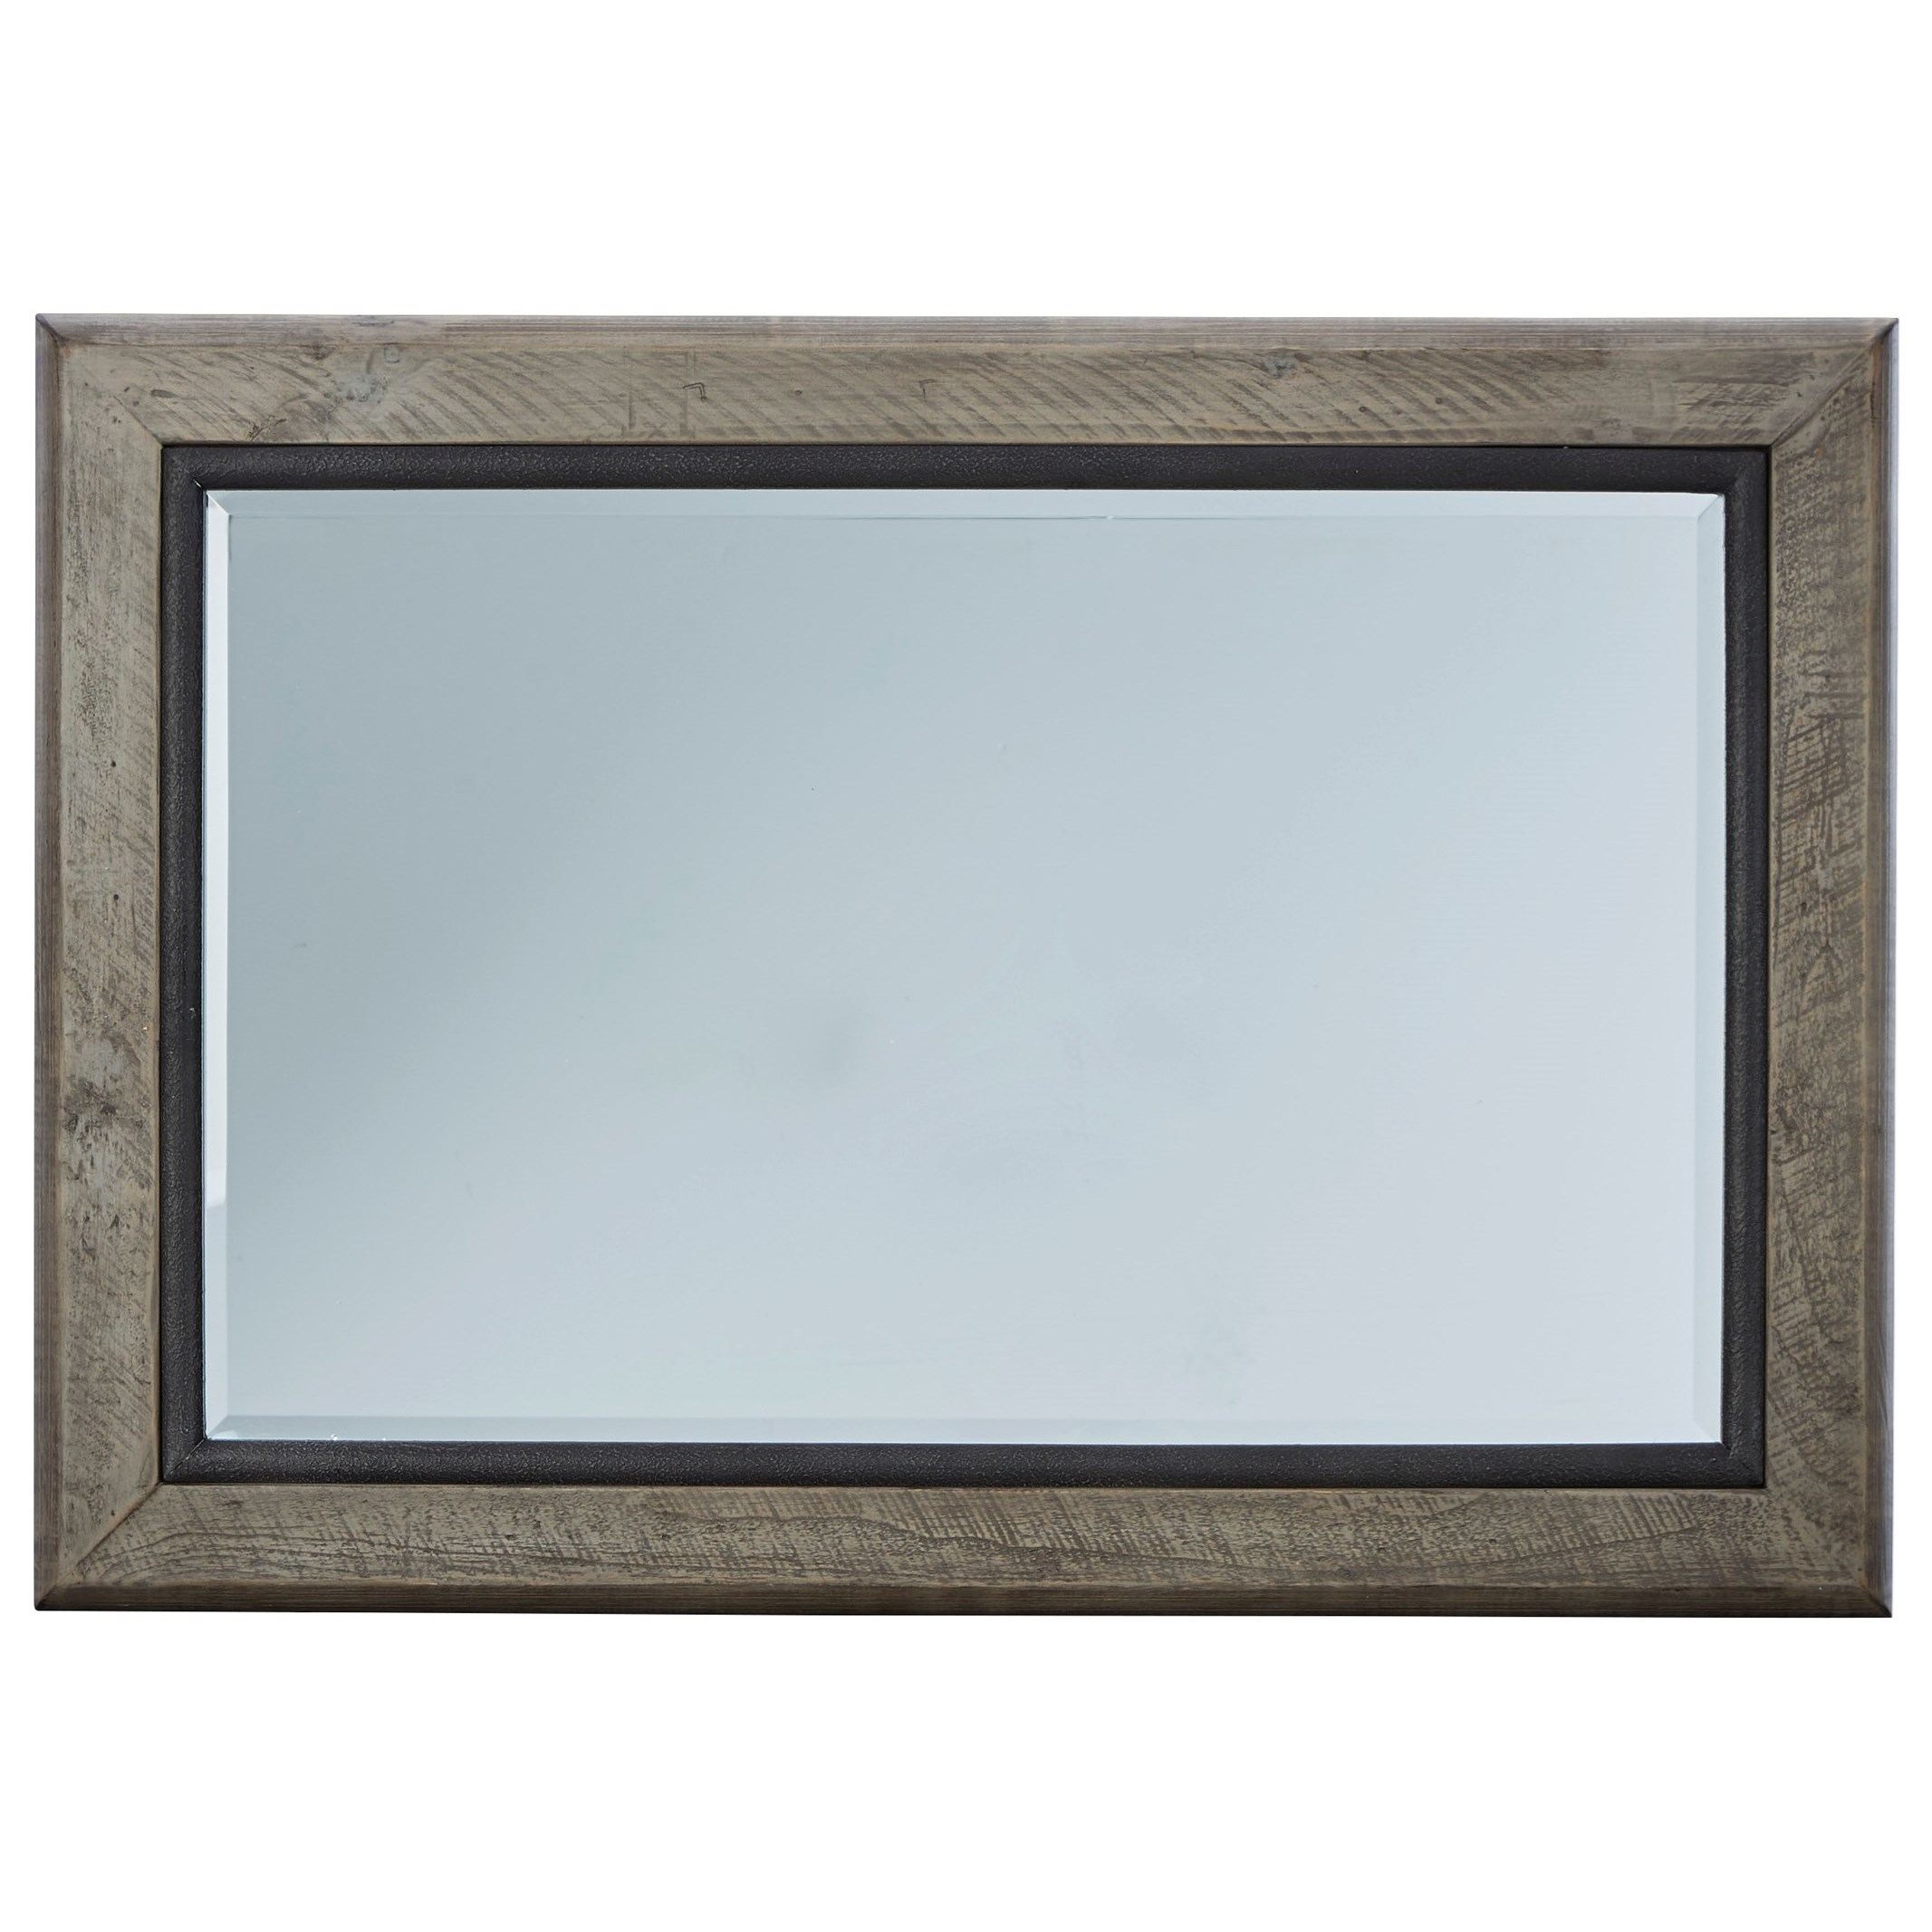 Brennagan Mirror by Ashley (Signature Design) at Johnny Janosik